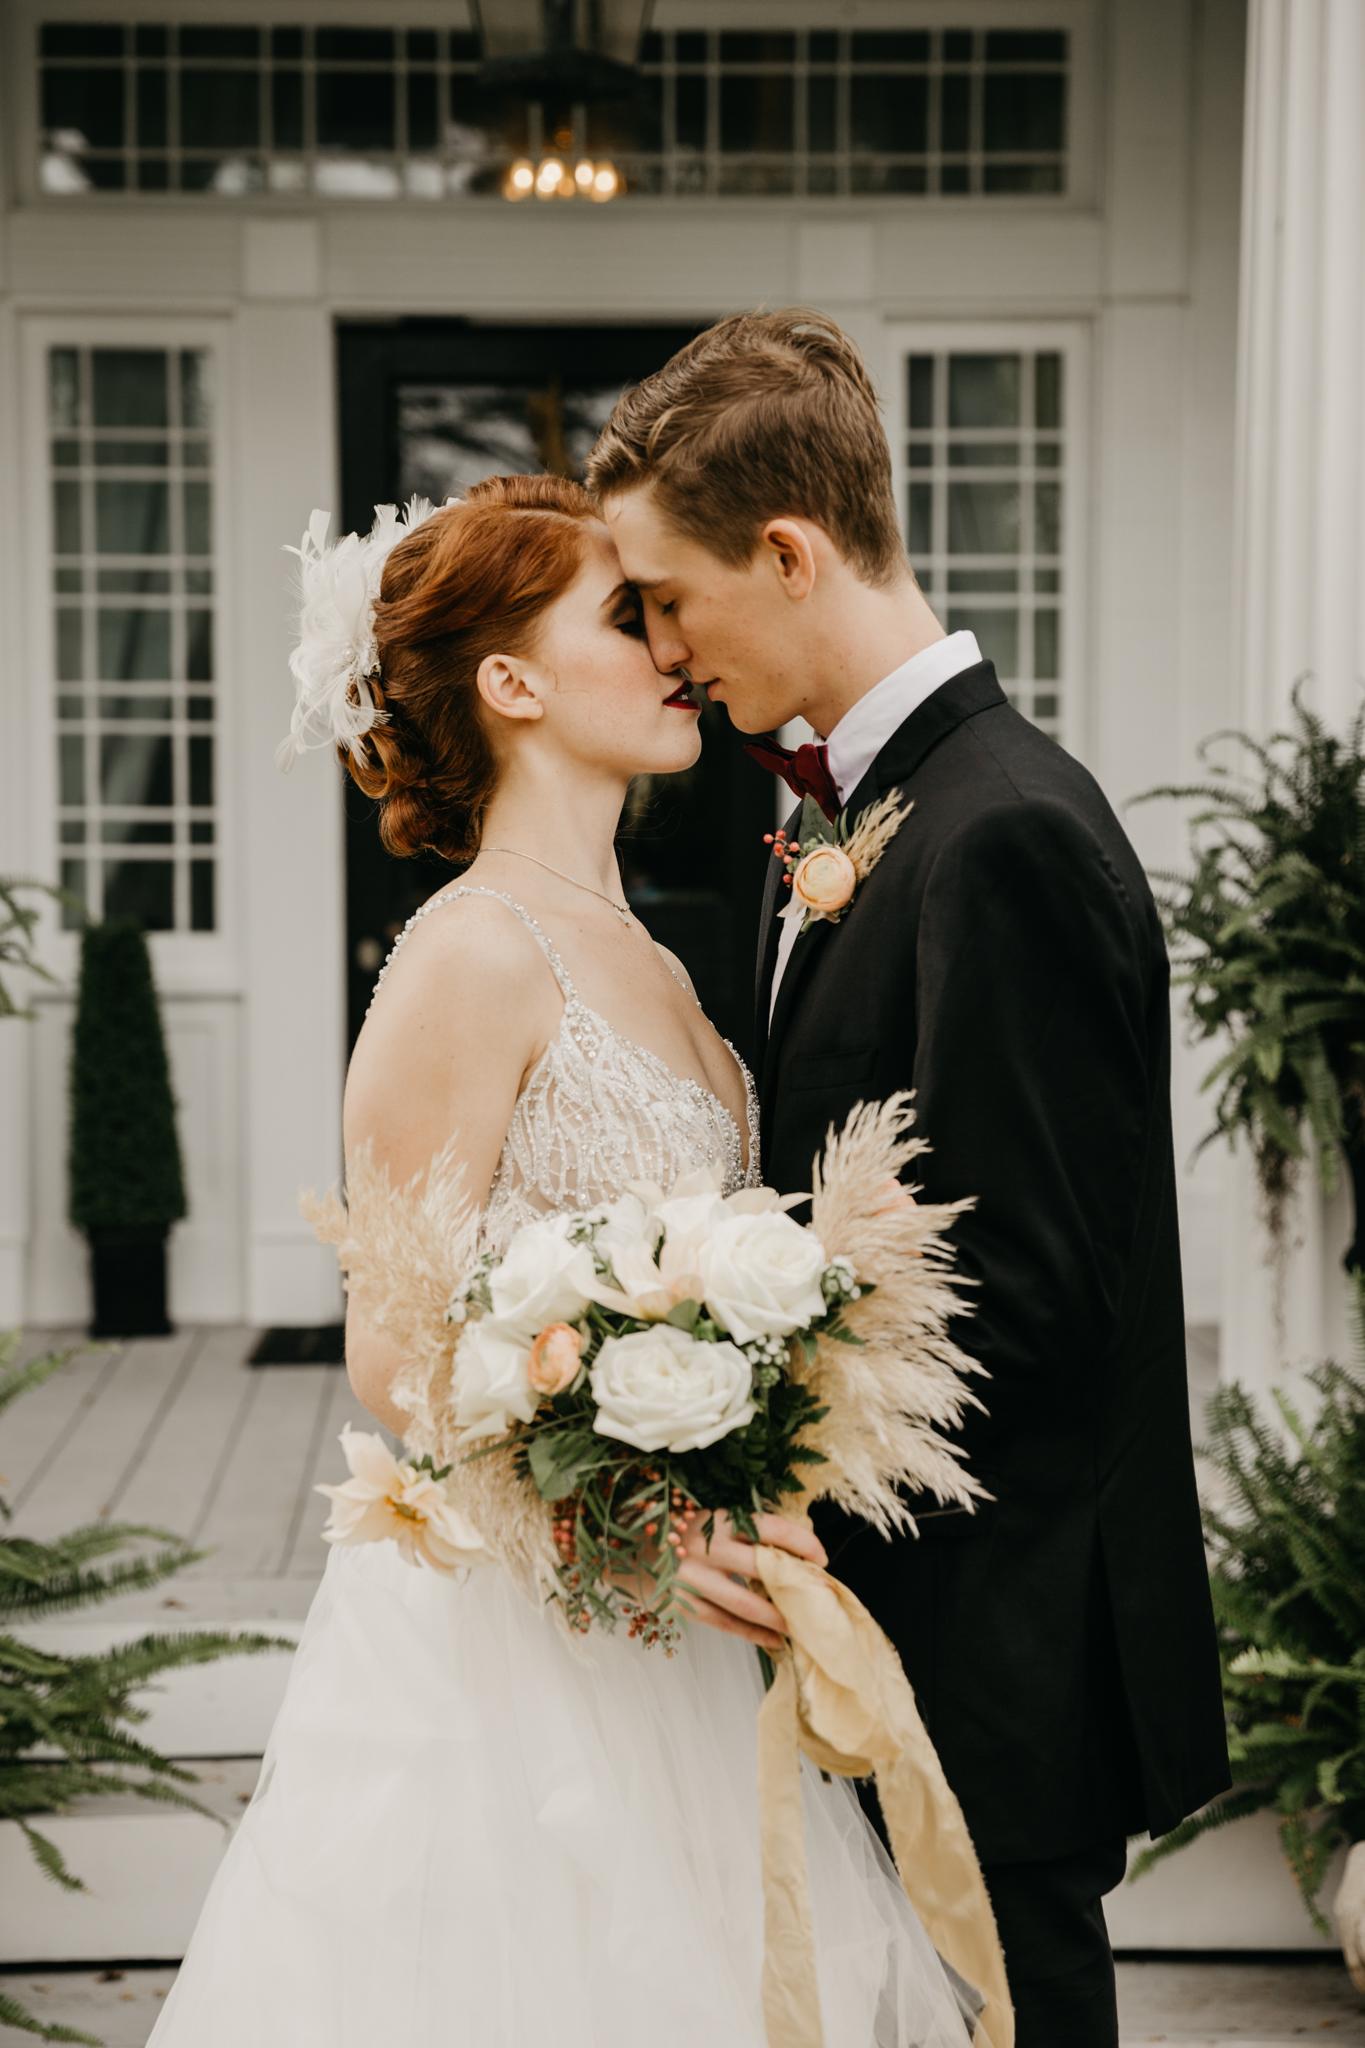 MonicaLeavellPhoto-North-Georgia-Intimate-Wedding-Photographer-2.jpg